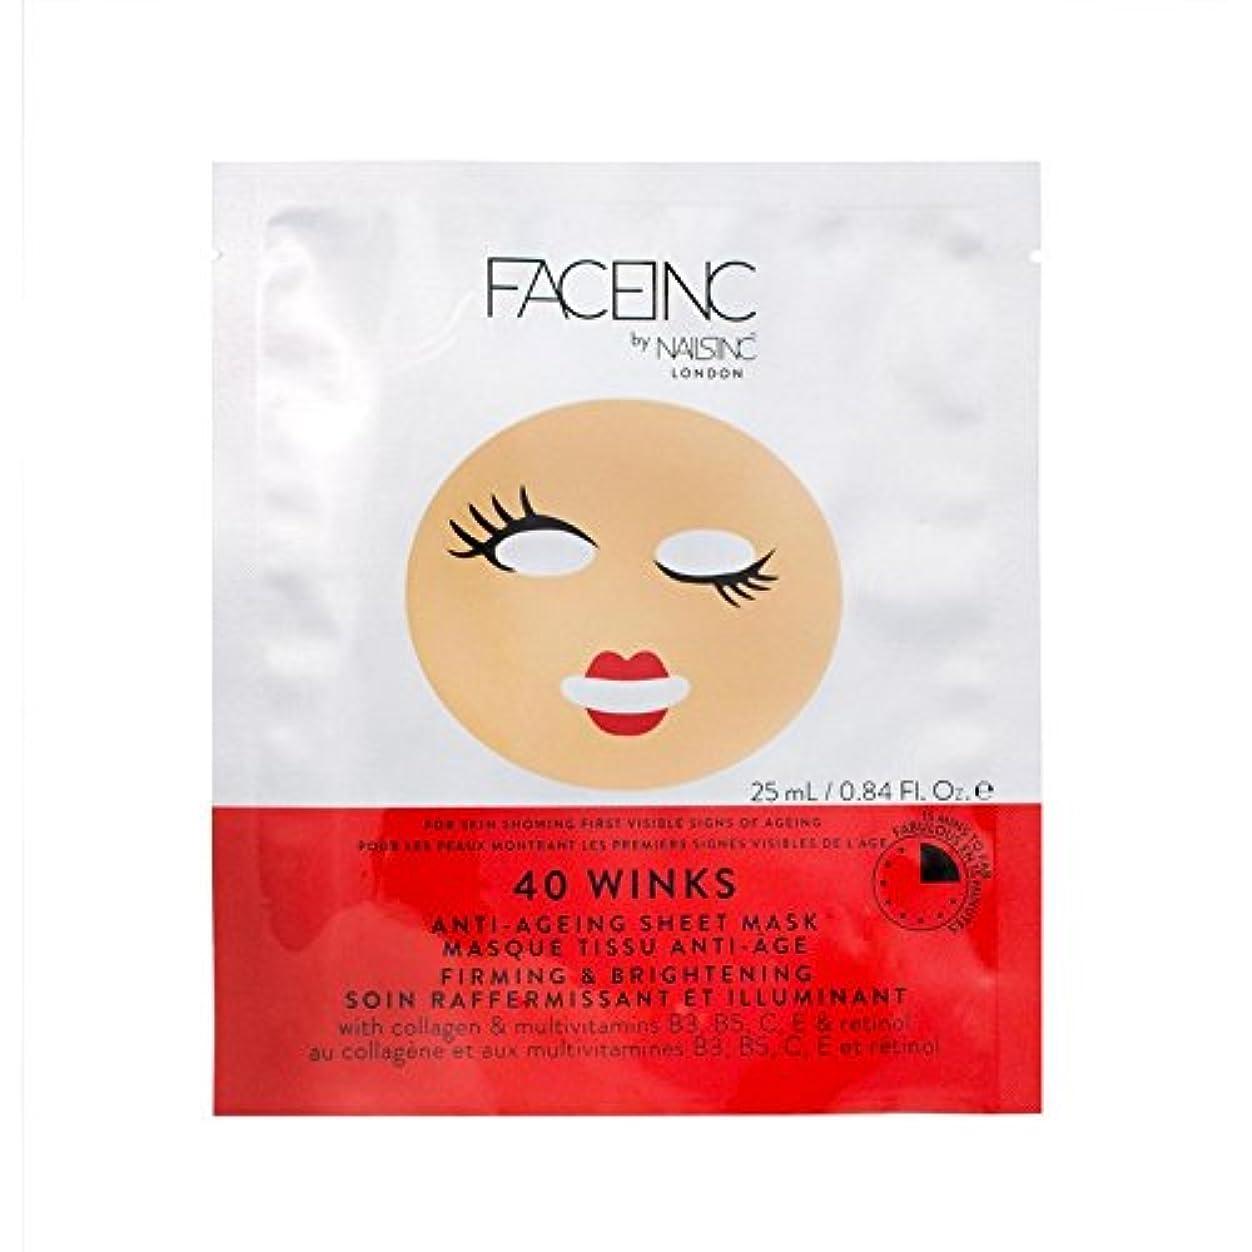 Nails Inc. Face Inc 40 Winks Mask (Pack of 6) - 爪が株式会社顔株式会社40のウィンクは、マスク x6 [並行輸入品]